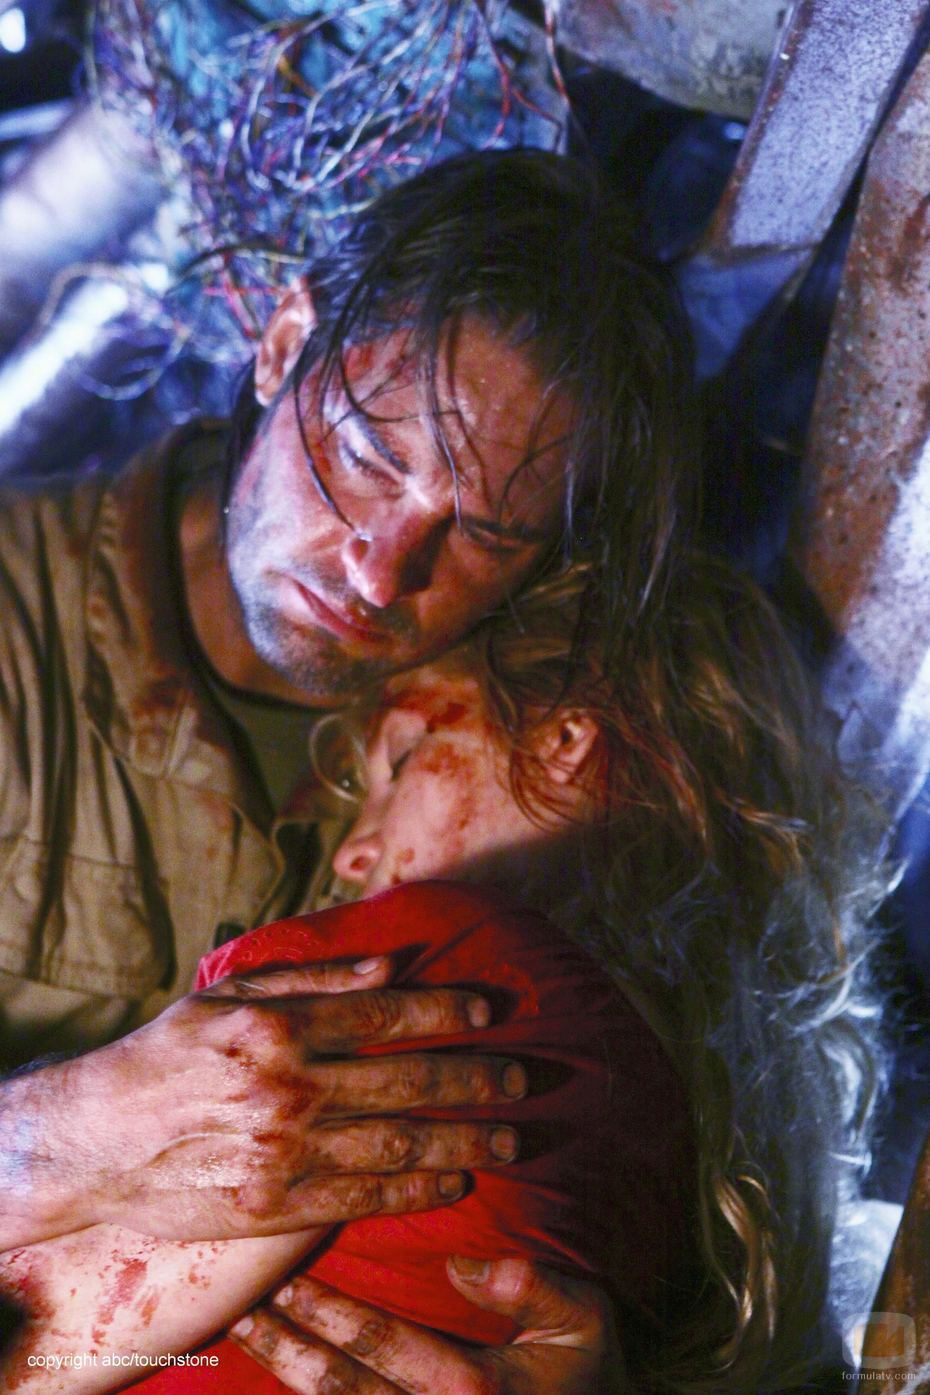 Sawyer abraza a Juliet muerta